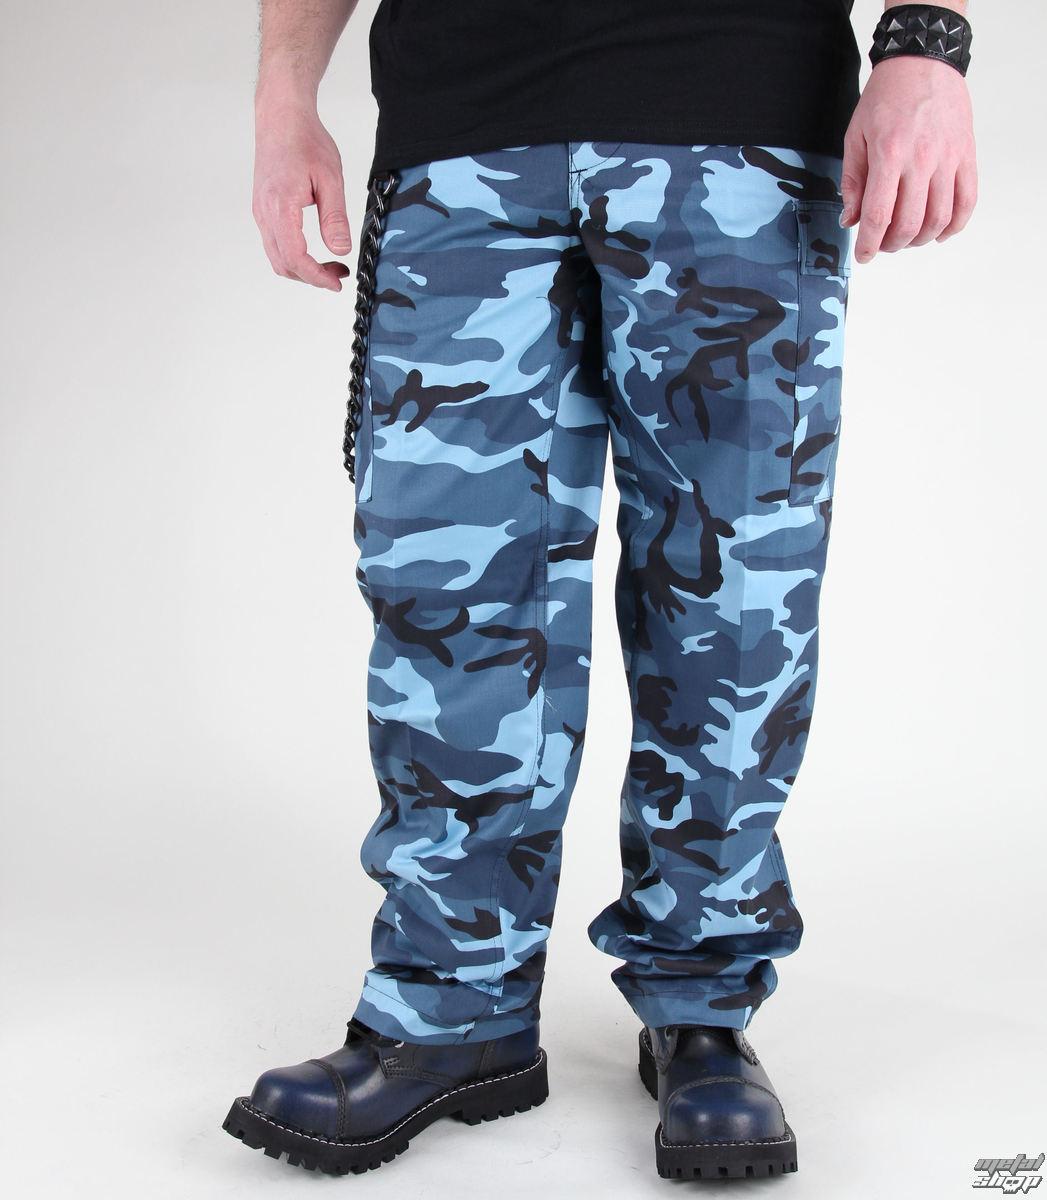 kalhoty pánské MIL-TEC - US Ranger Hose - BDU Skyblue - 11810023